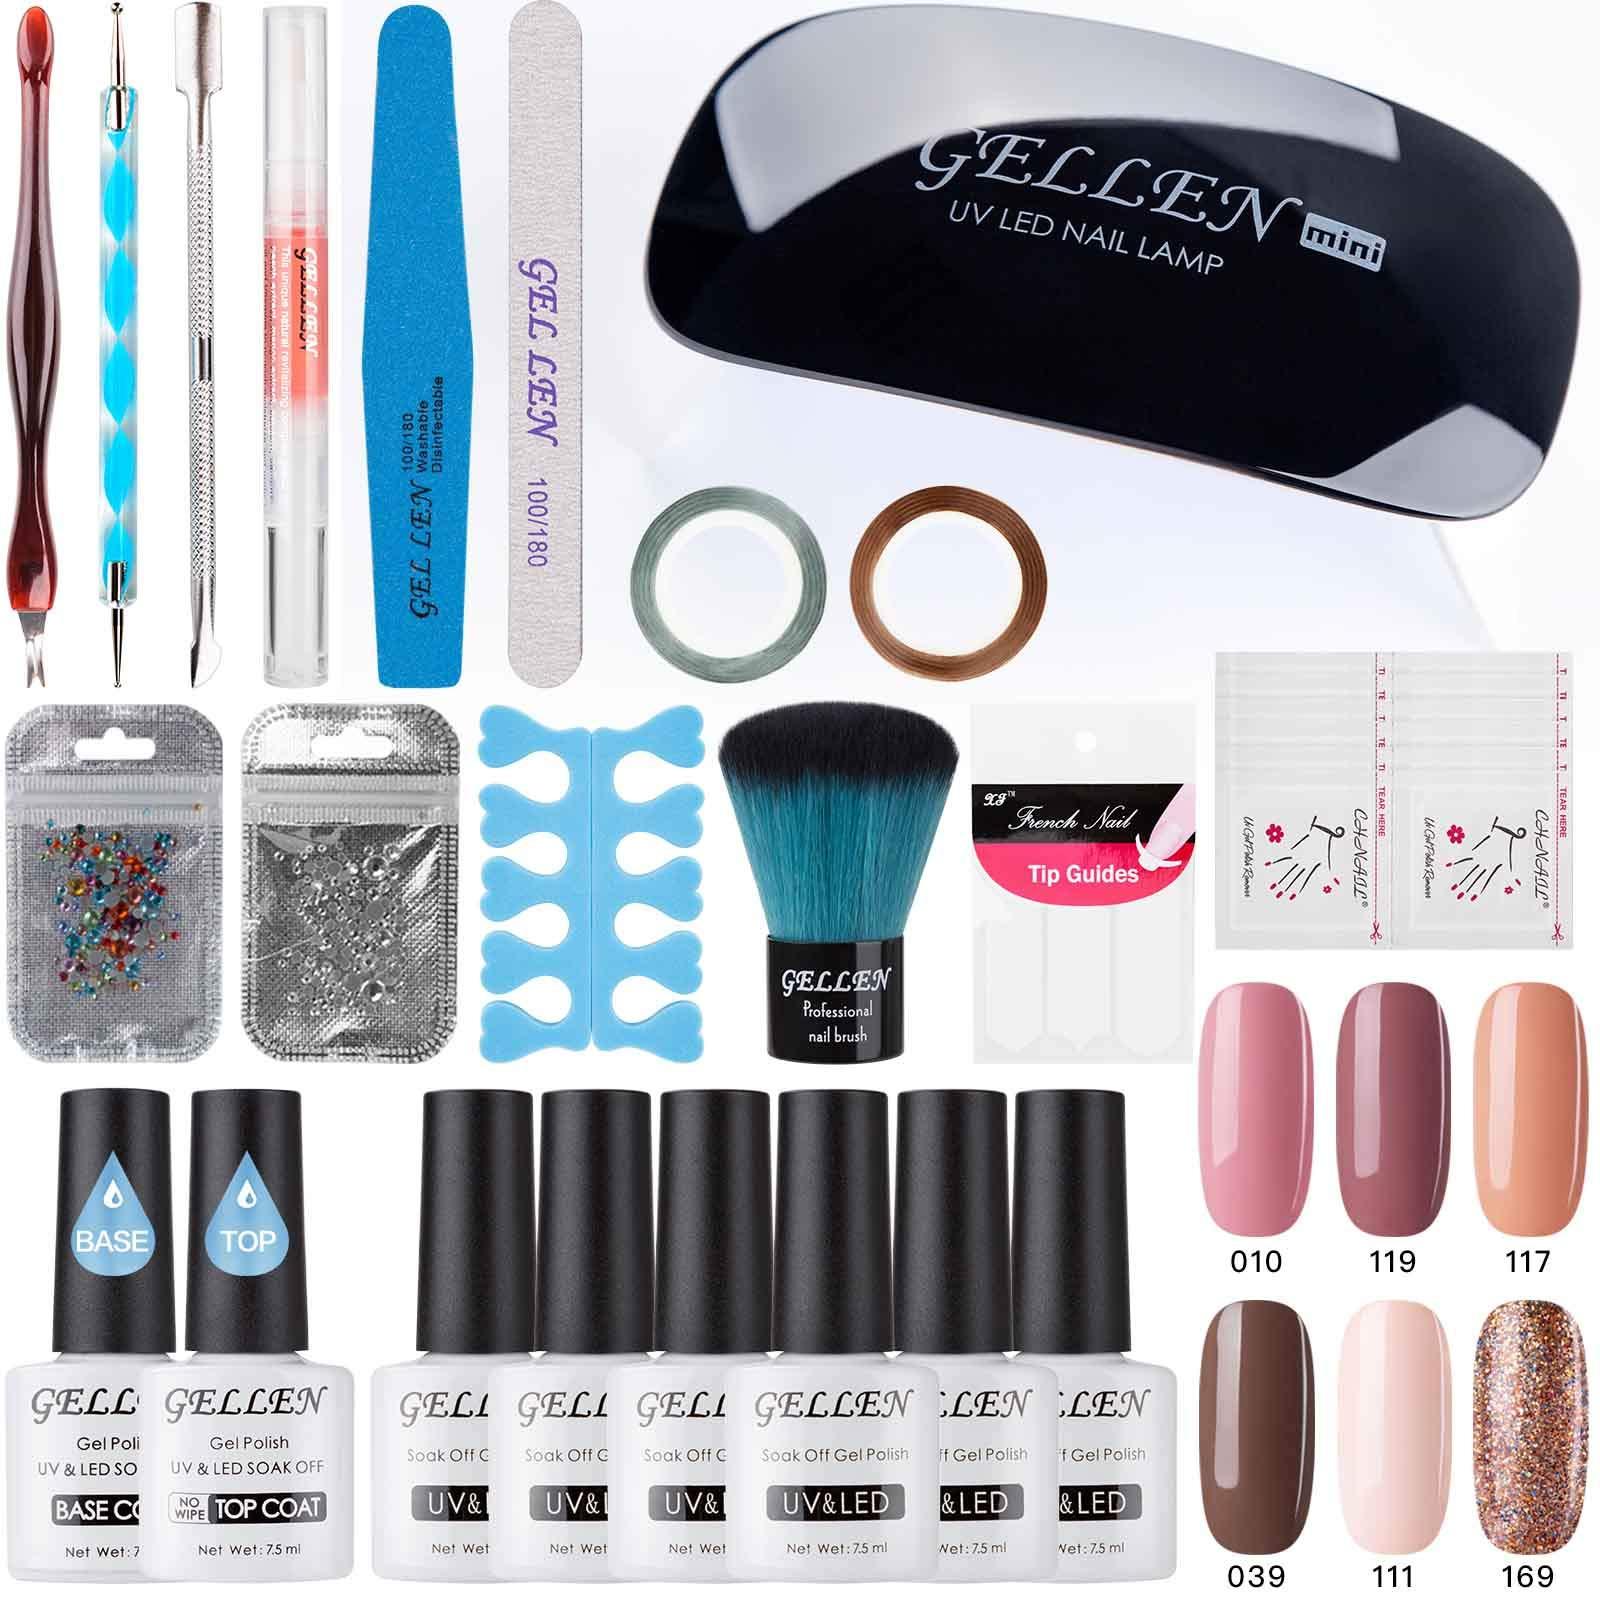 Gellen Gel Nail Polish Starter Kit - Selected 6 Colors, with Top Coat Base Coat Nail LED Lamp Nail Art Design Tools, Portable DIY Home Gel Manicure Set 002